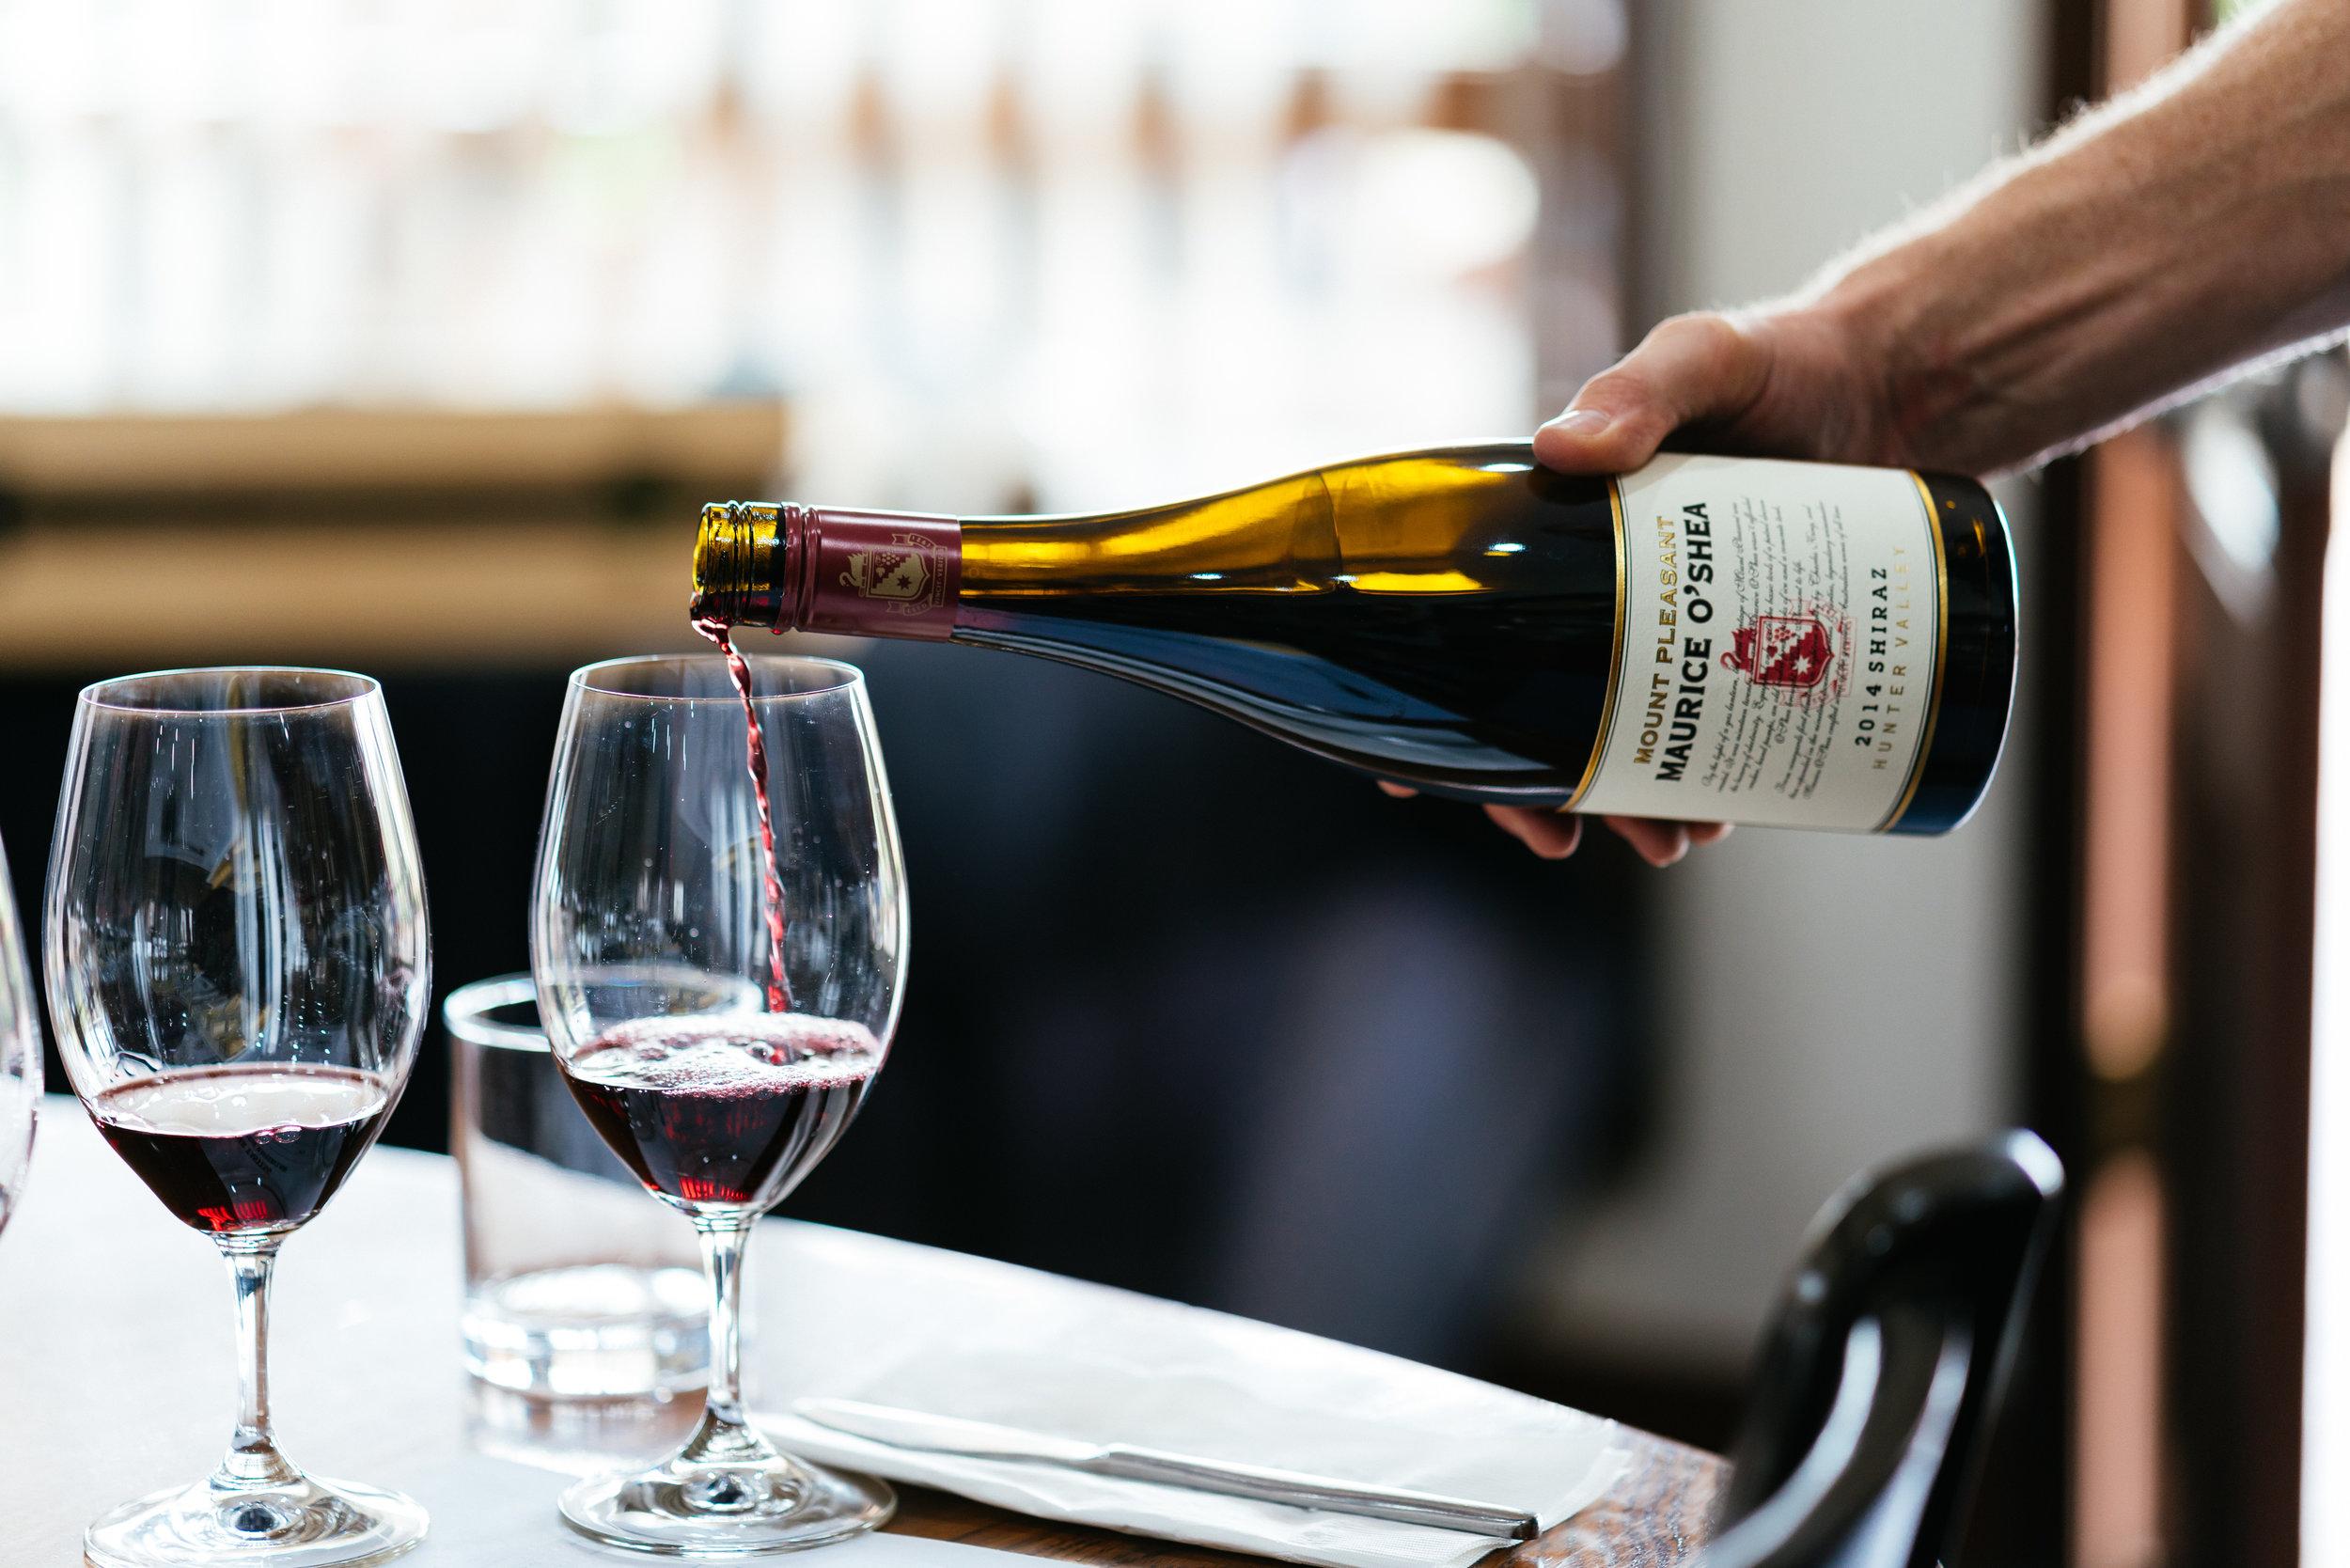 Pic credit: Mount Pleasant Wines